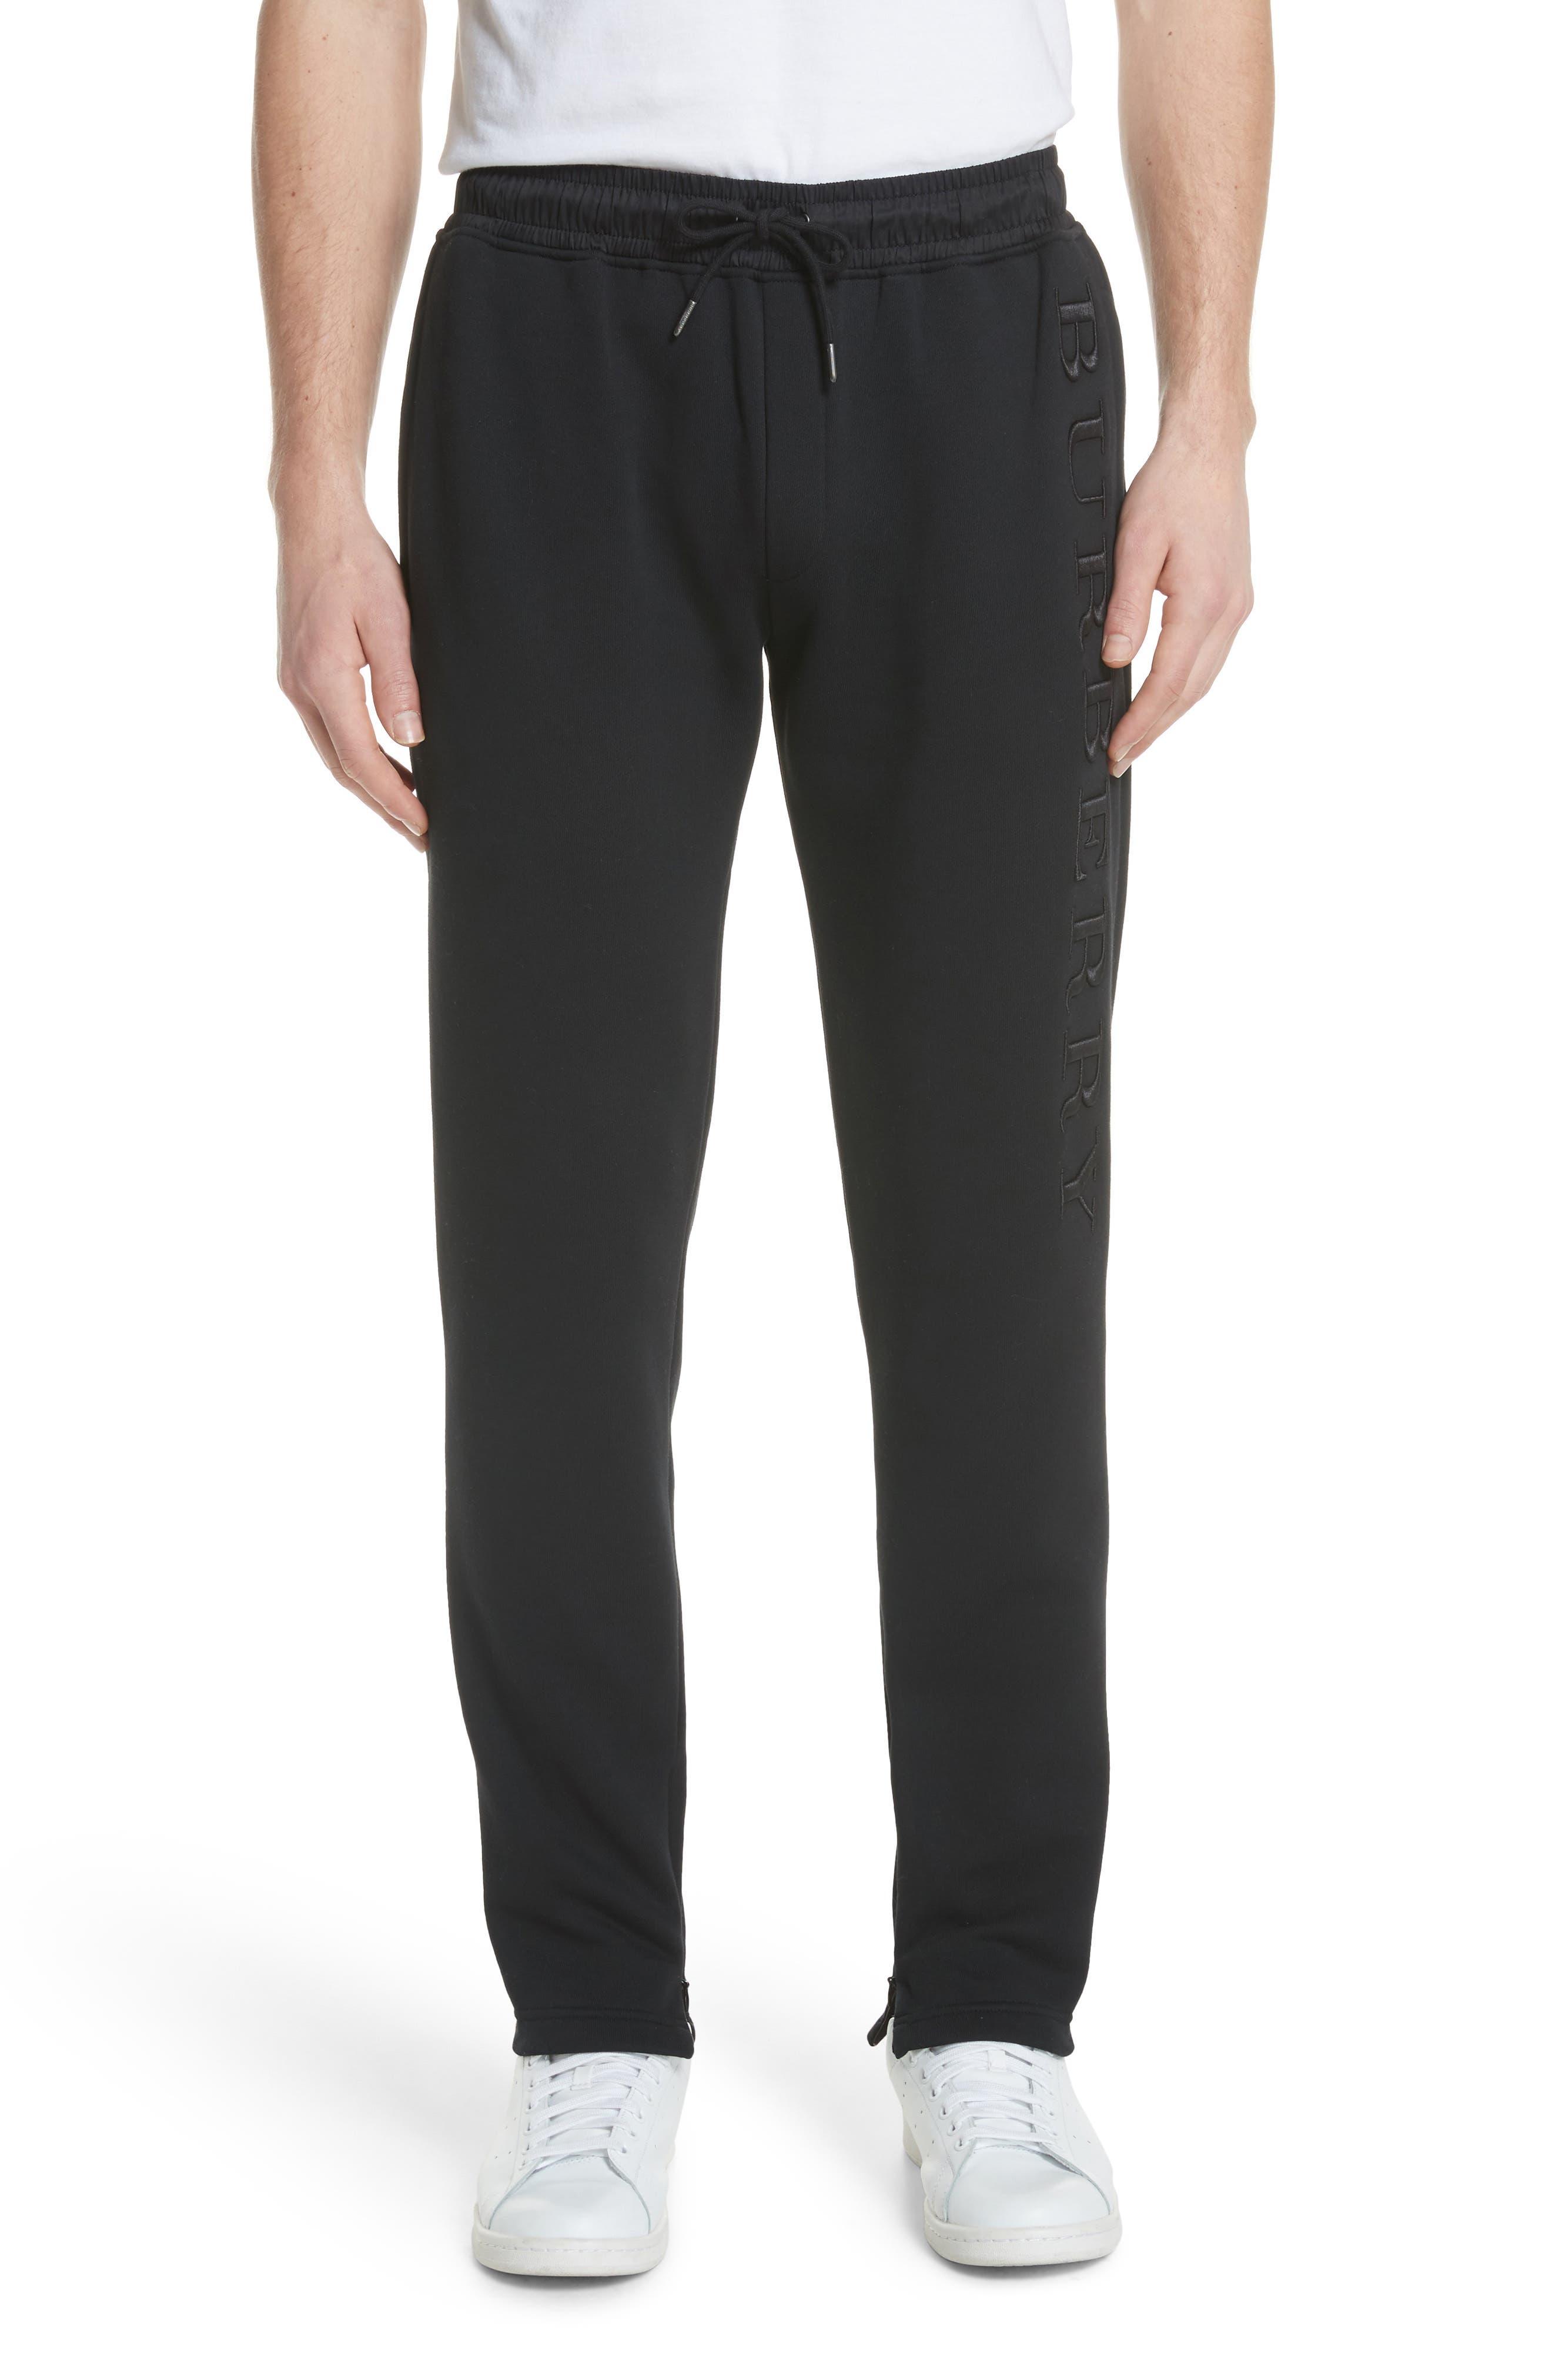 Nickford Lounge Pants,                         Main,                         color, 001